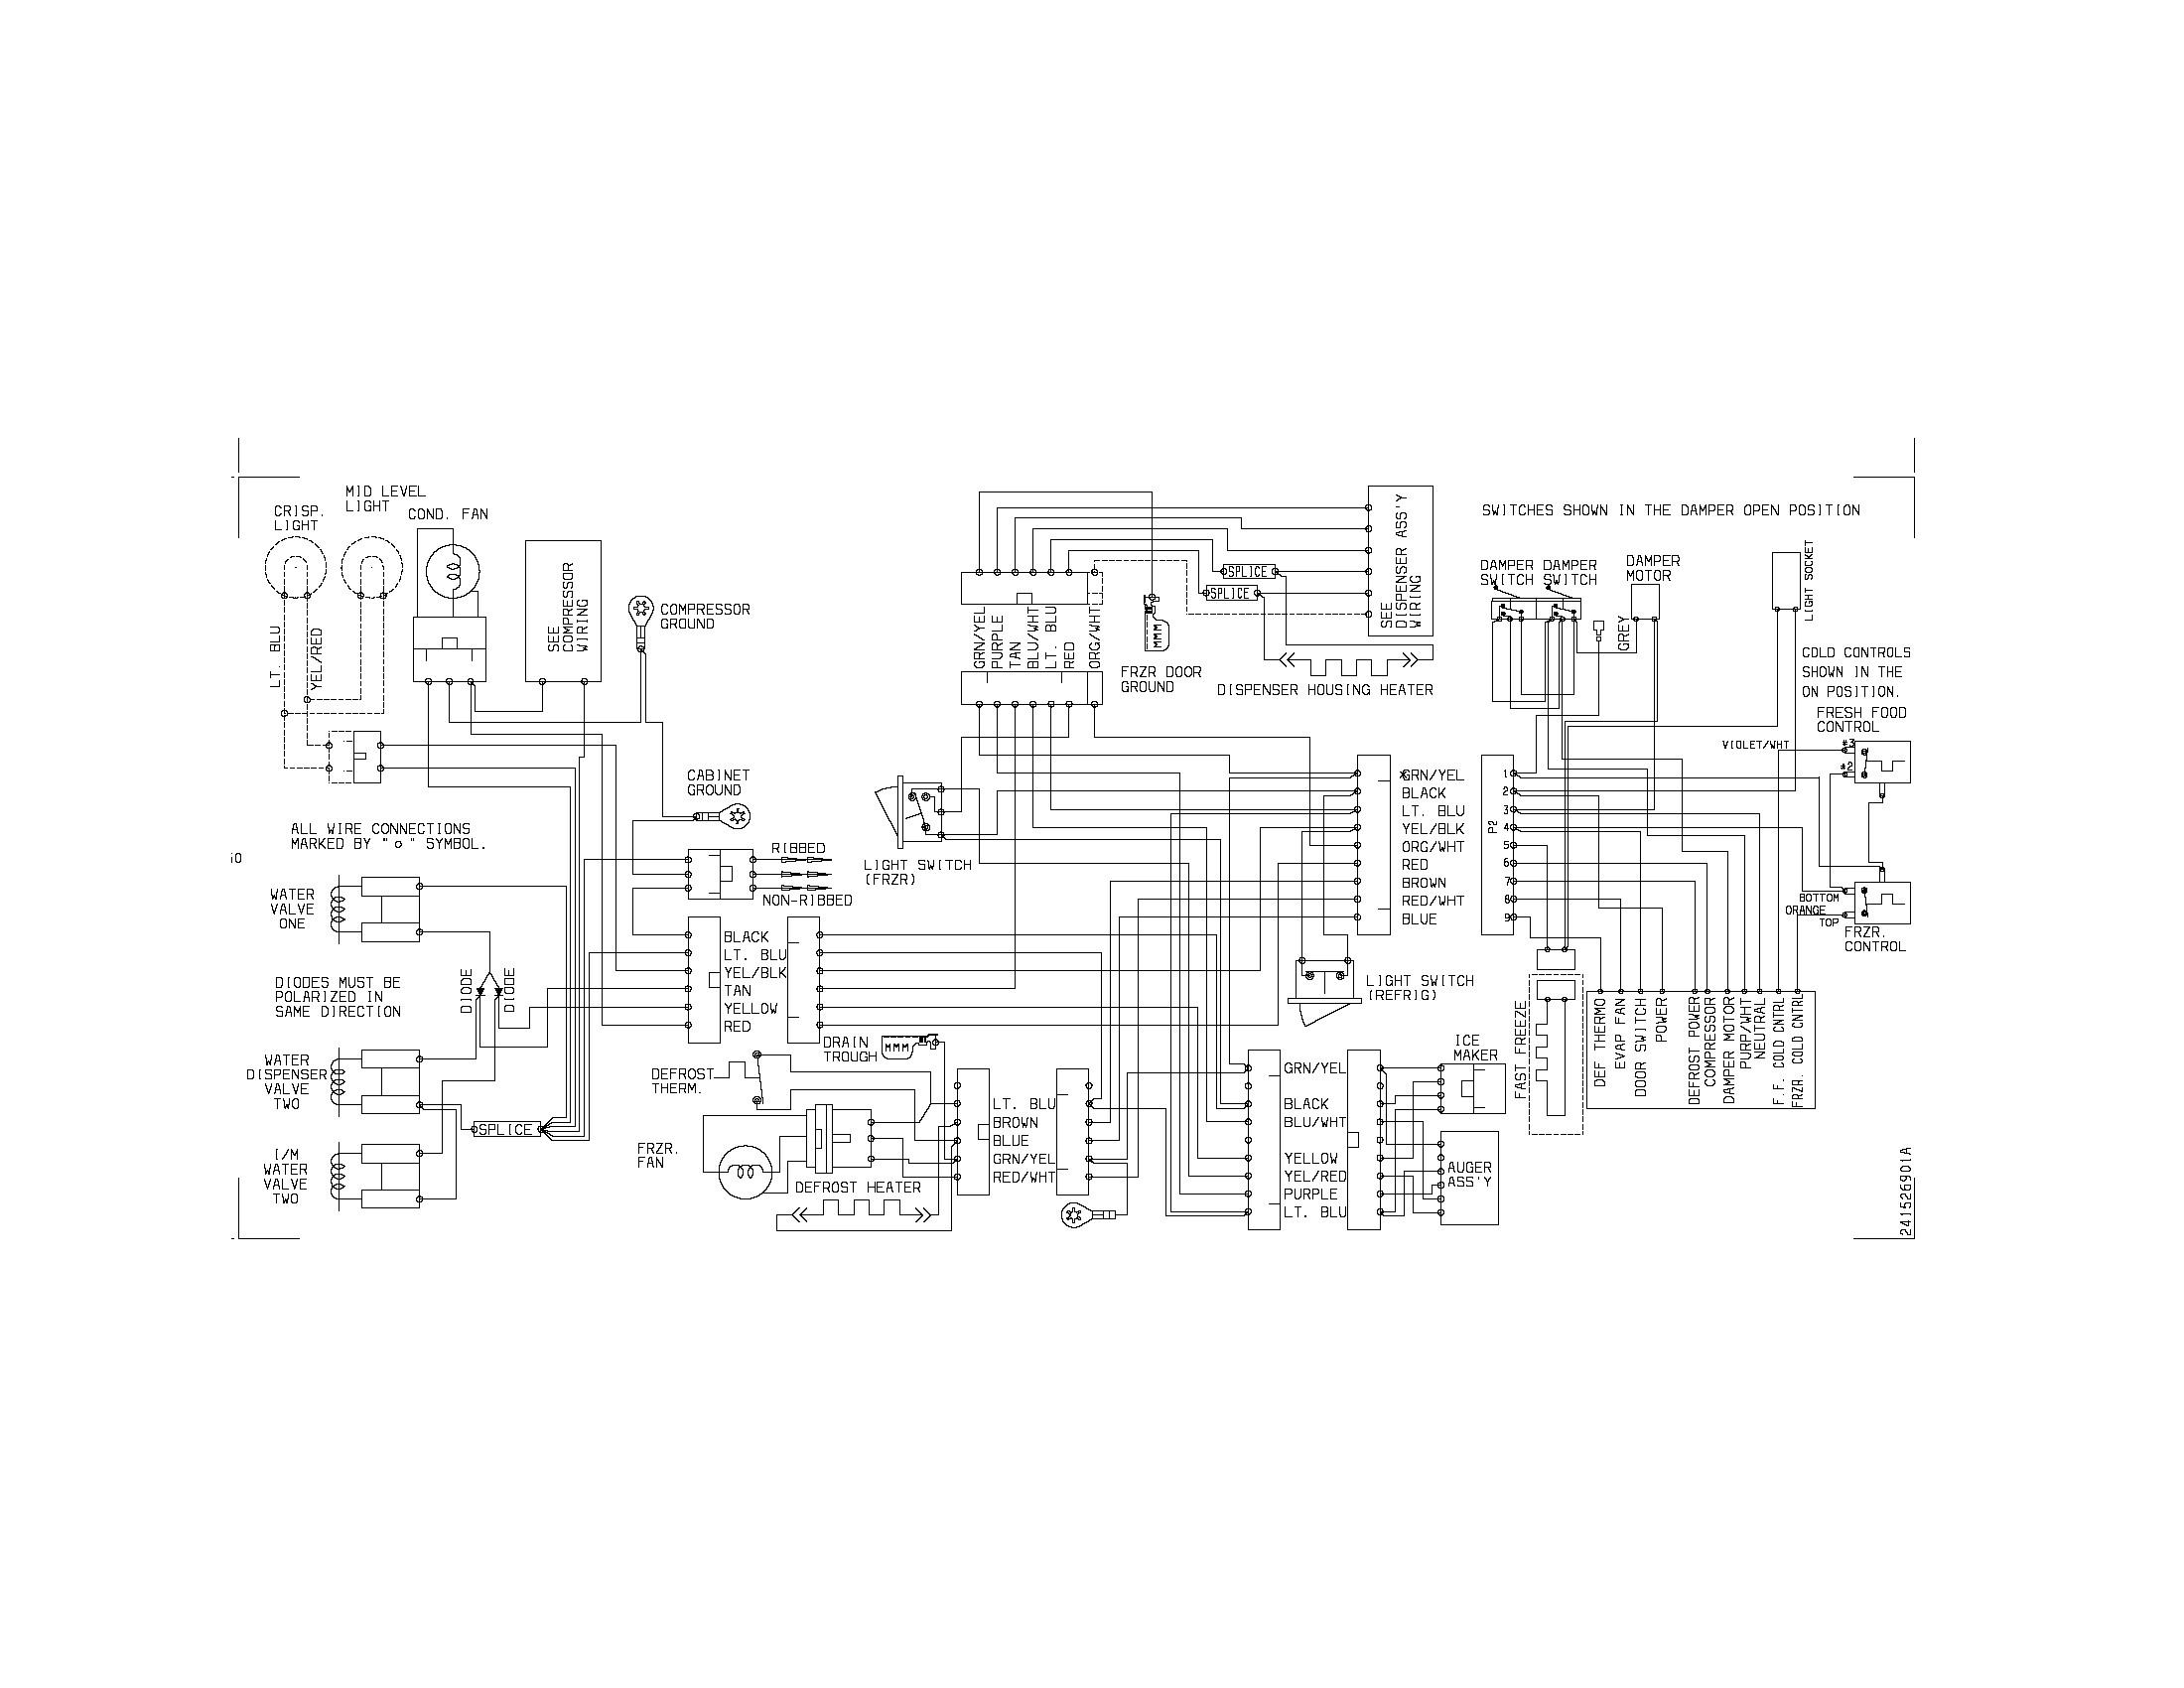 Westinghouse Ac Motor Wiring Diagram Westinghouse Wiring Diagrams Of Westinghouse Ac Motor Wiring Diagram